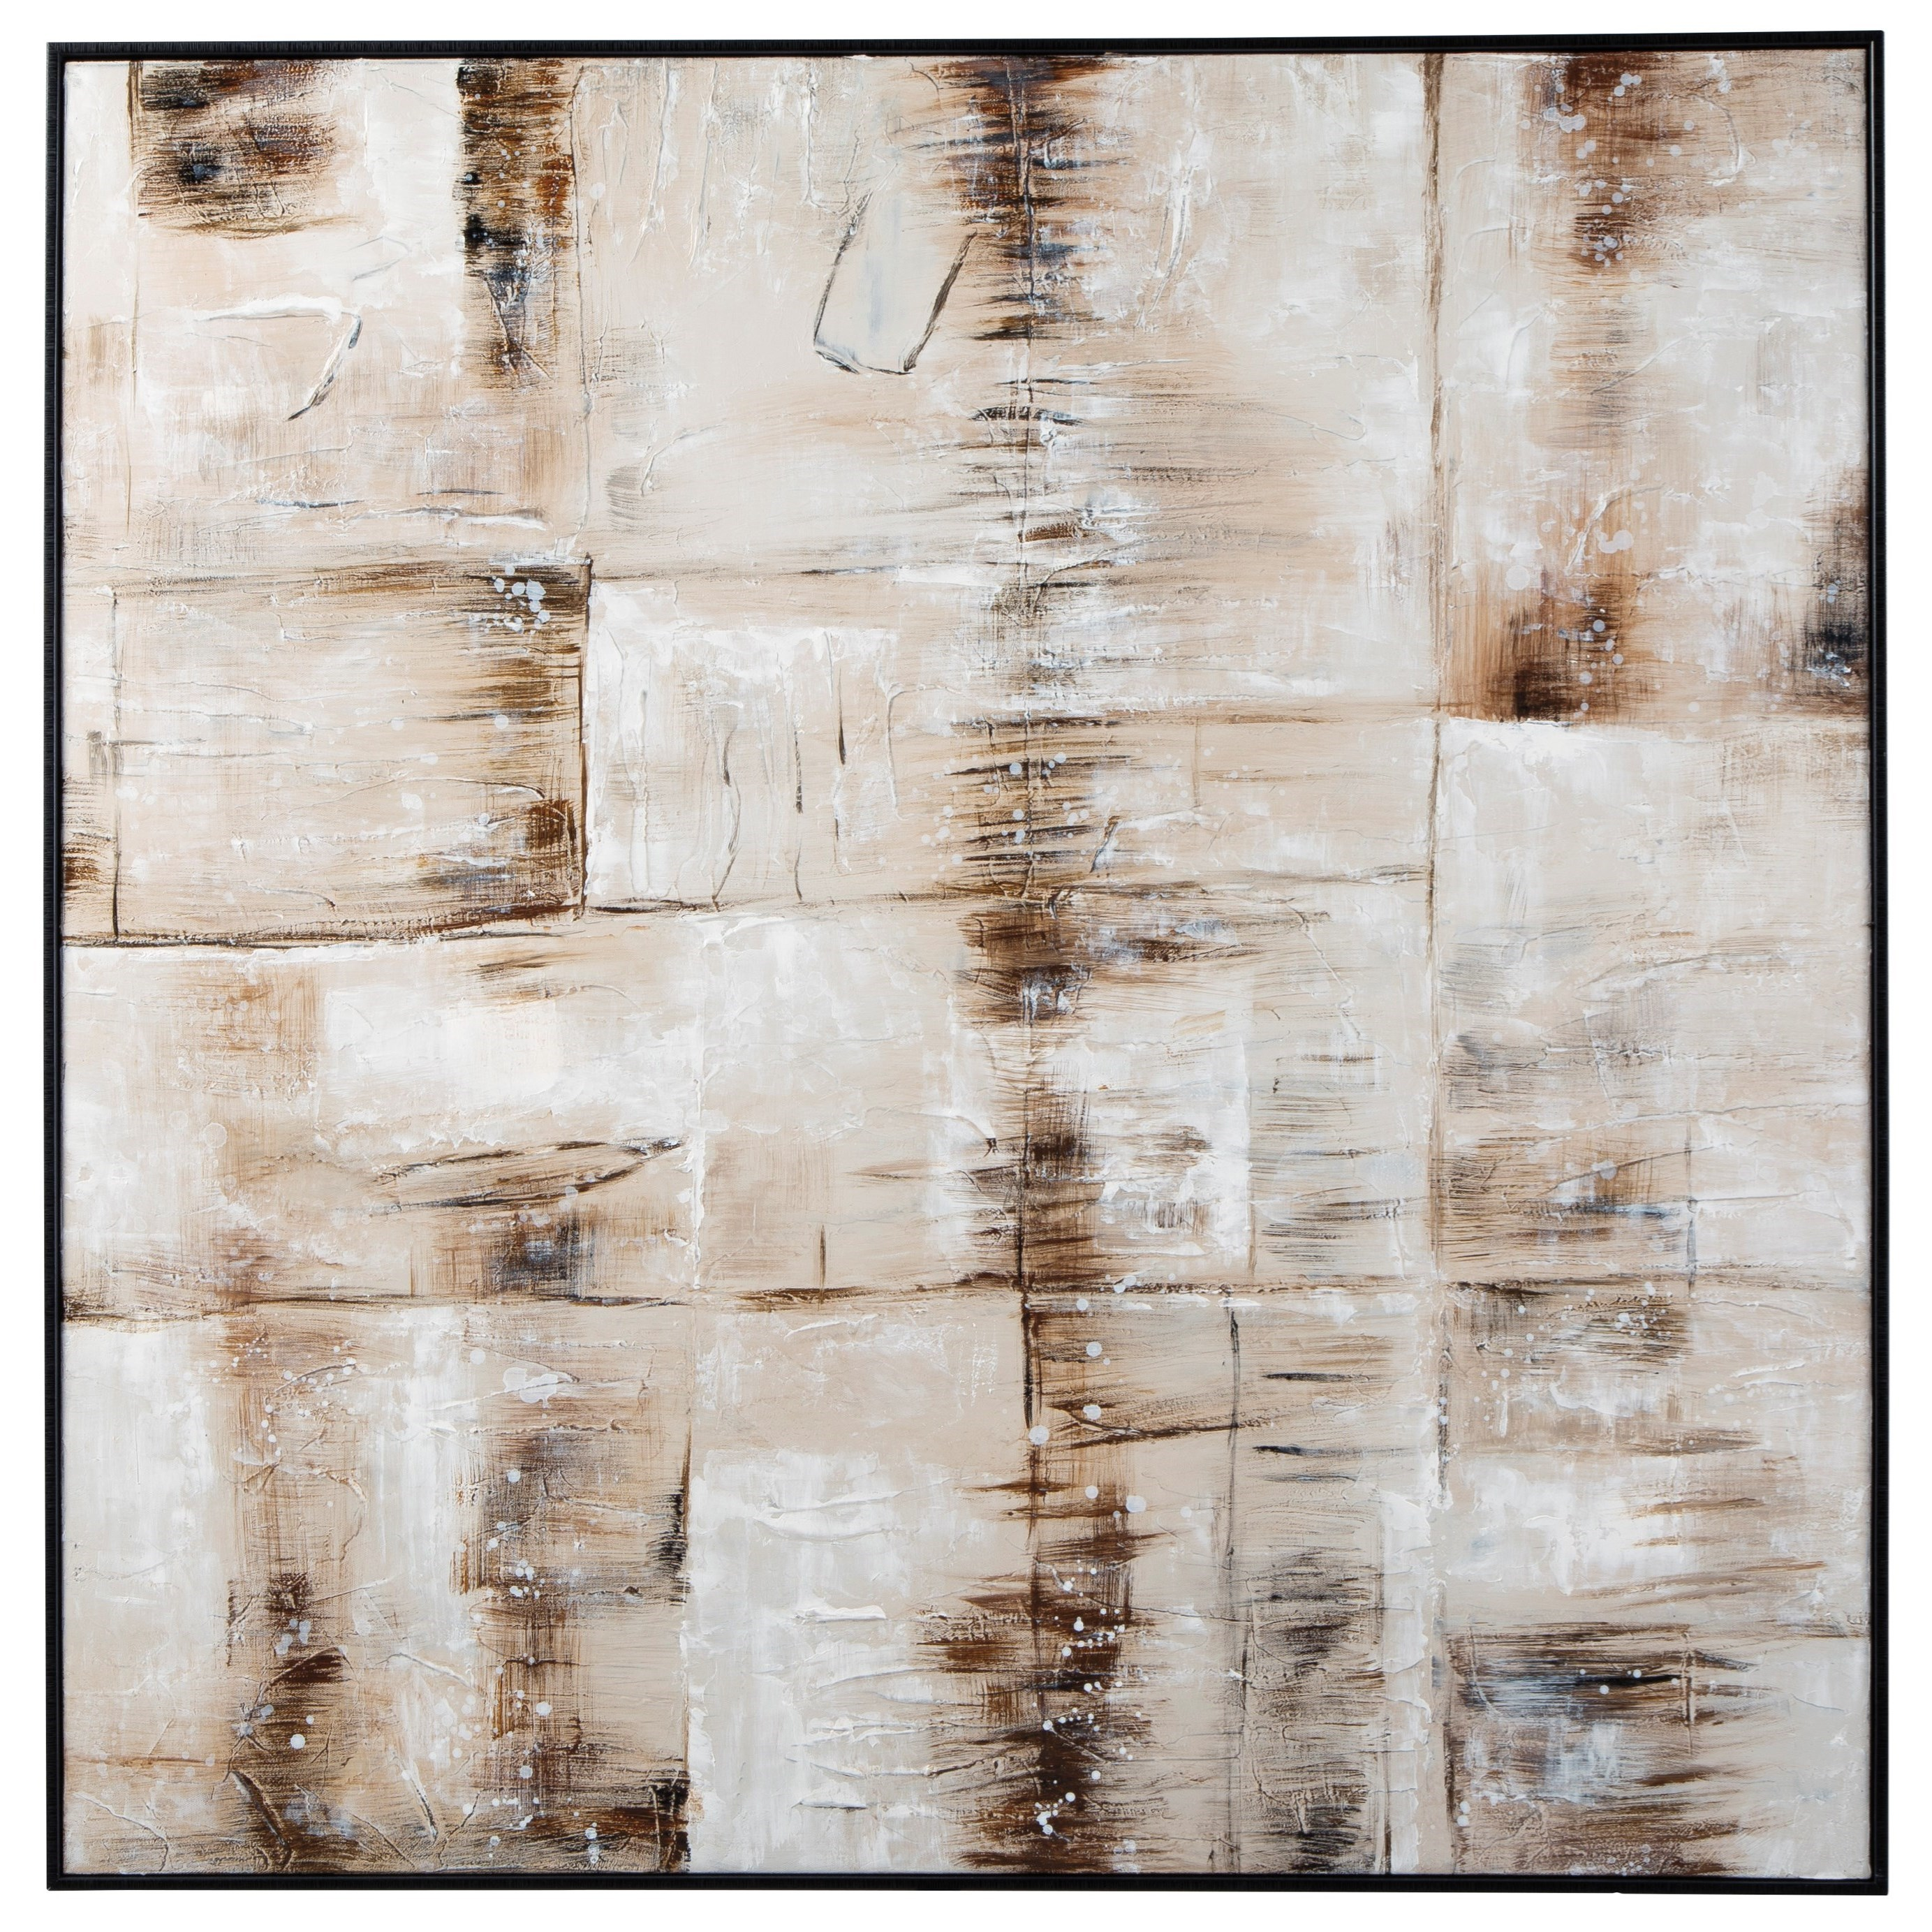 Wall Art Jovia Tan/Brown Wall Art by Signature at Walker's Furniture